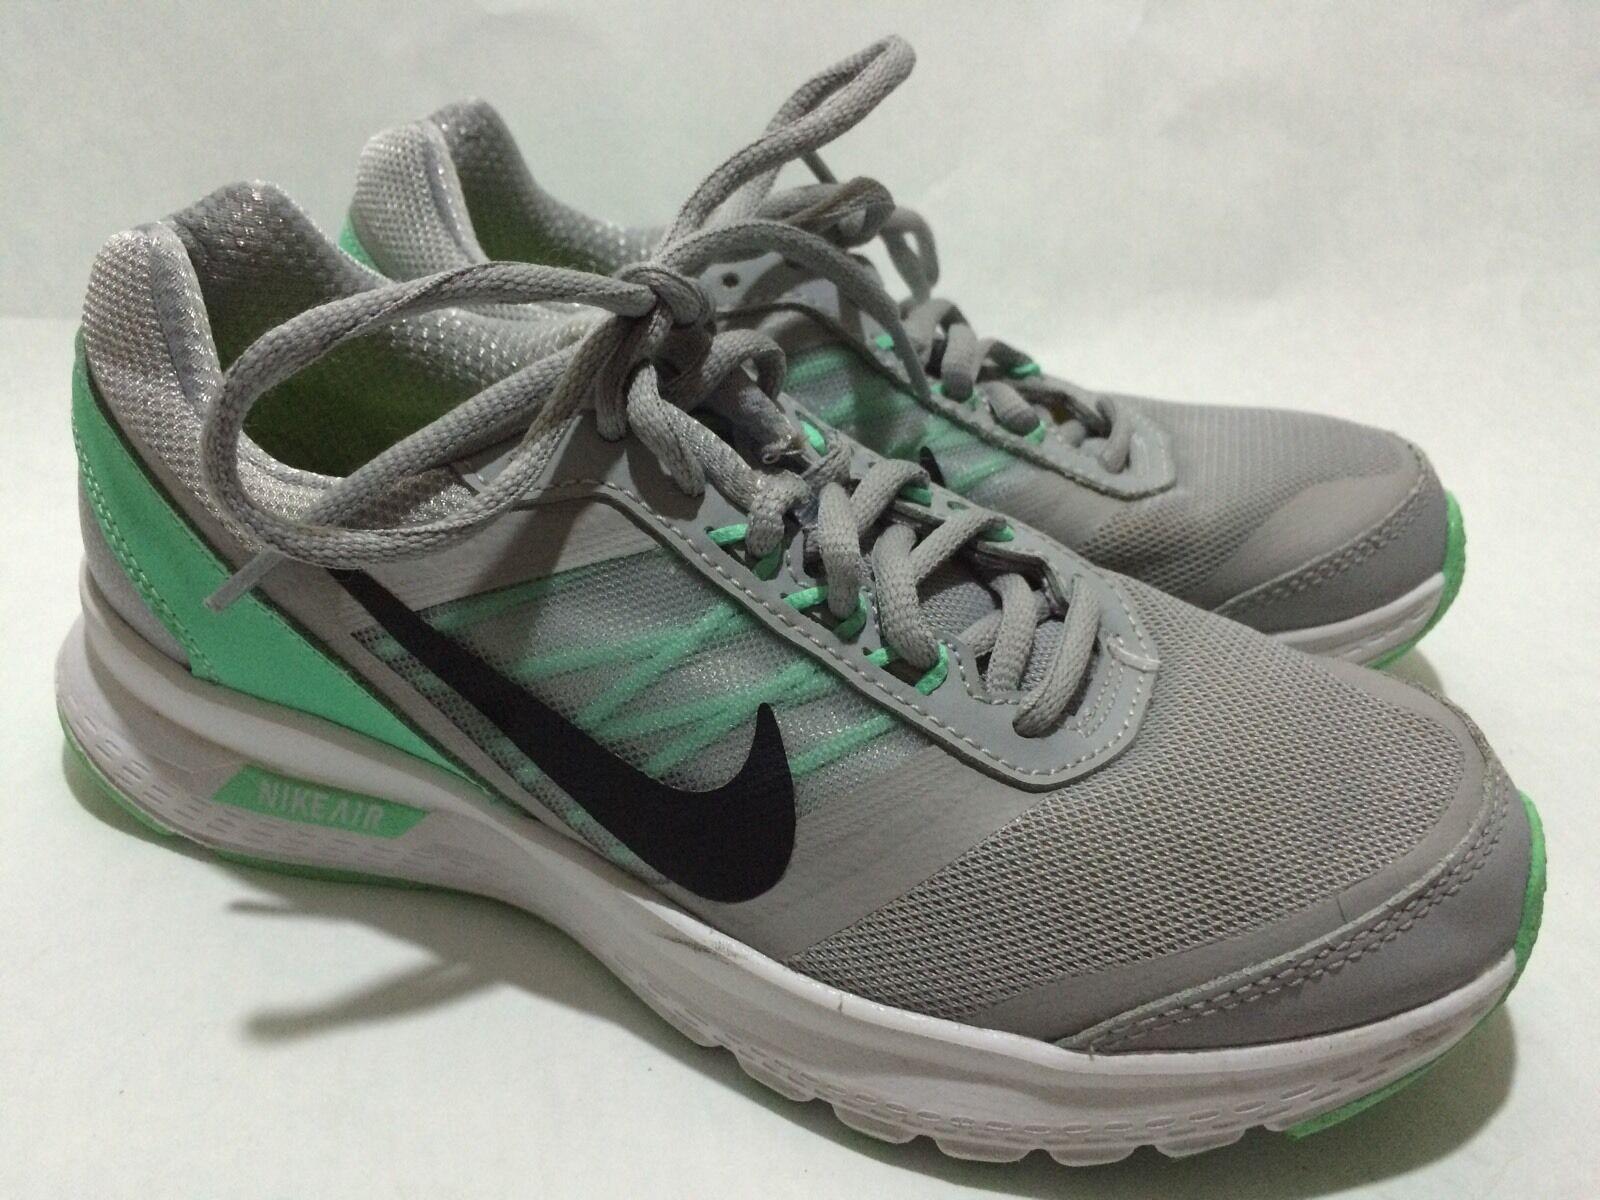 Nike Air 807098-002 Grey/Green Women's Running Shoes Comfortable Great discount